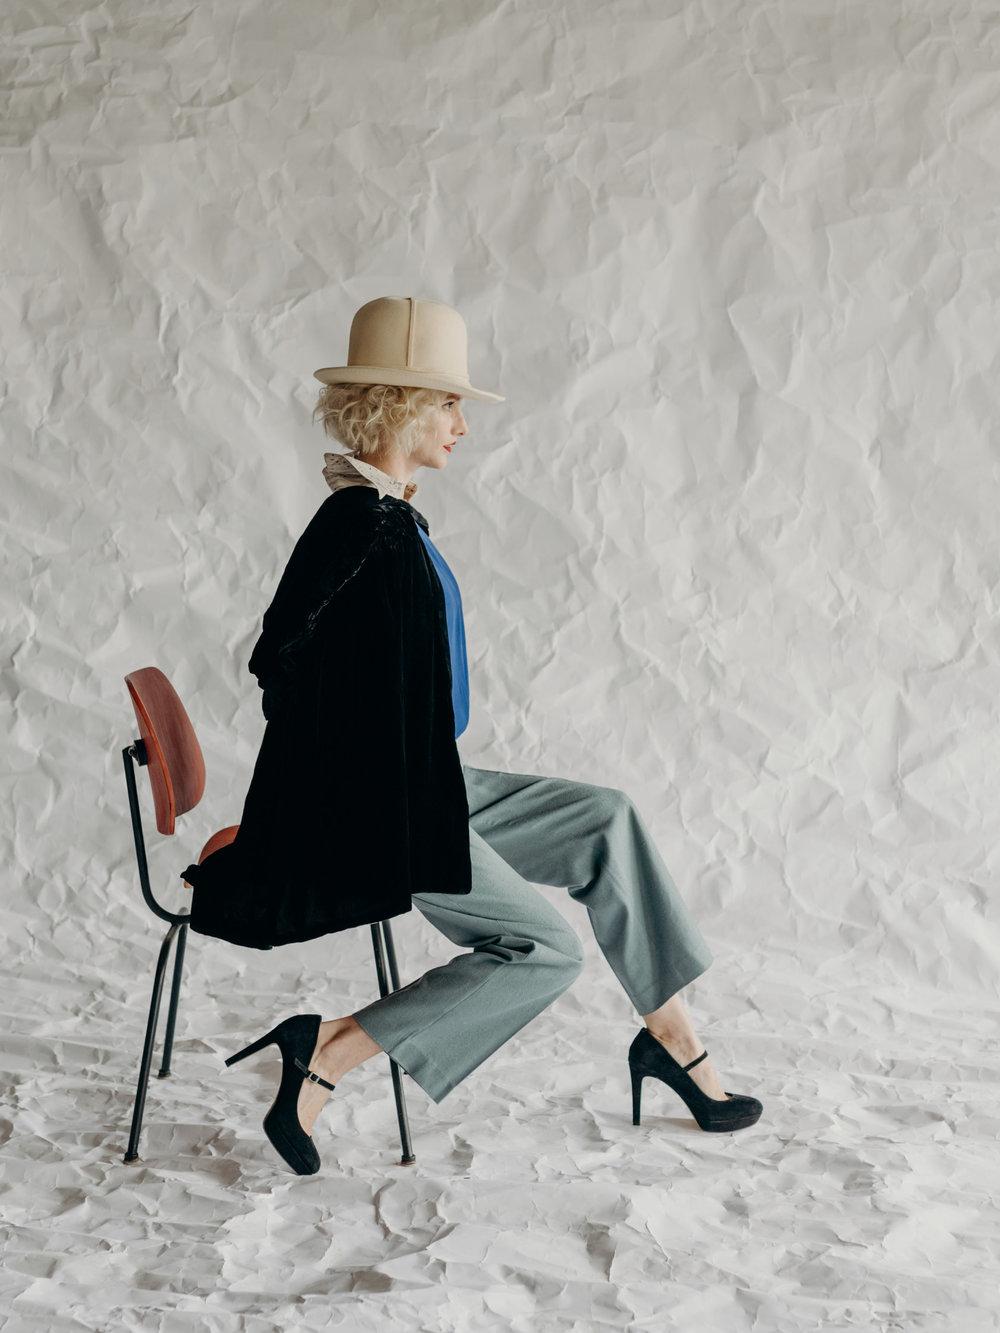 portland_fashion_photographer-19.jpg